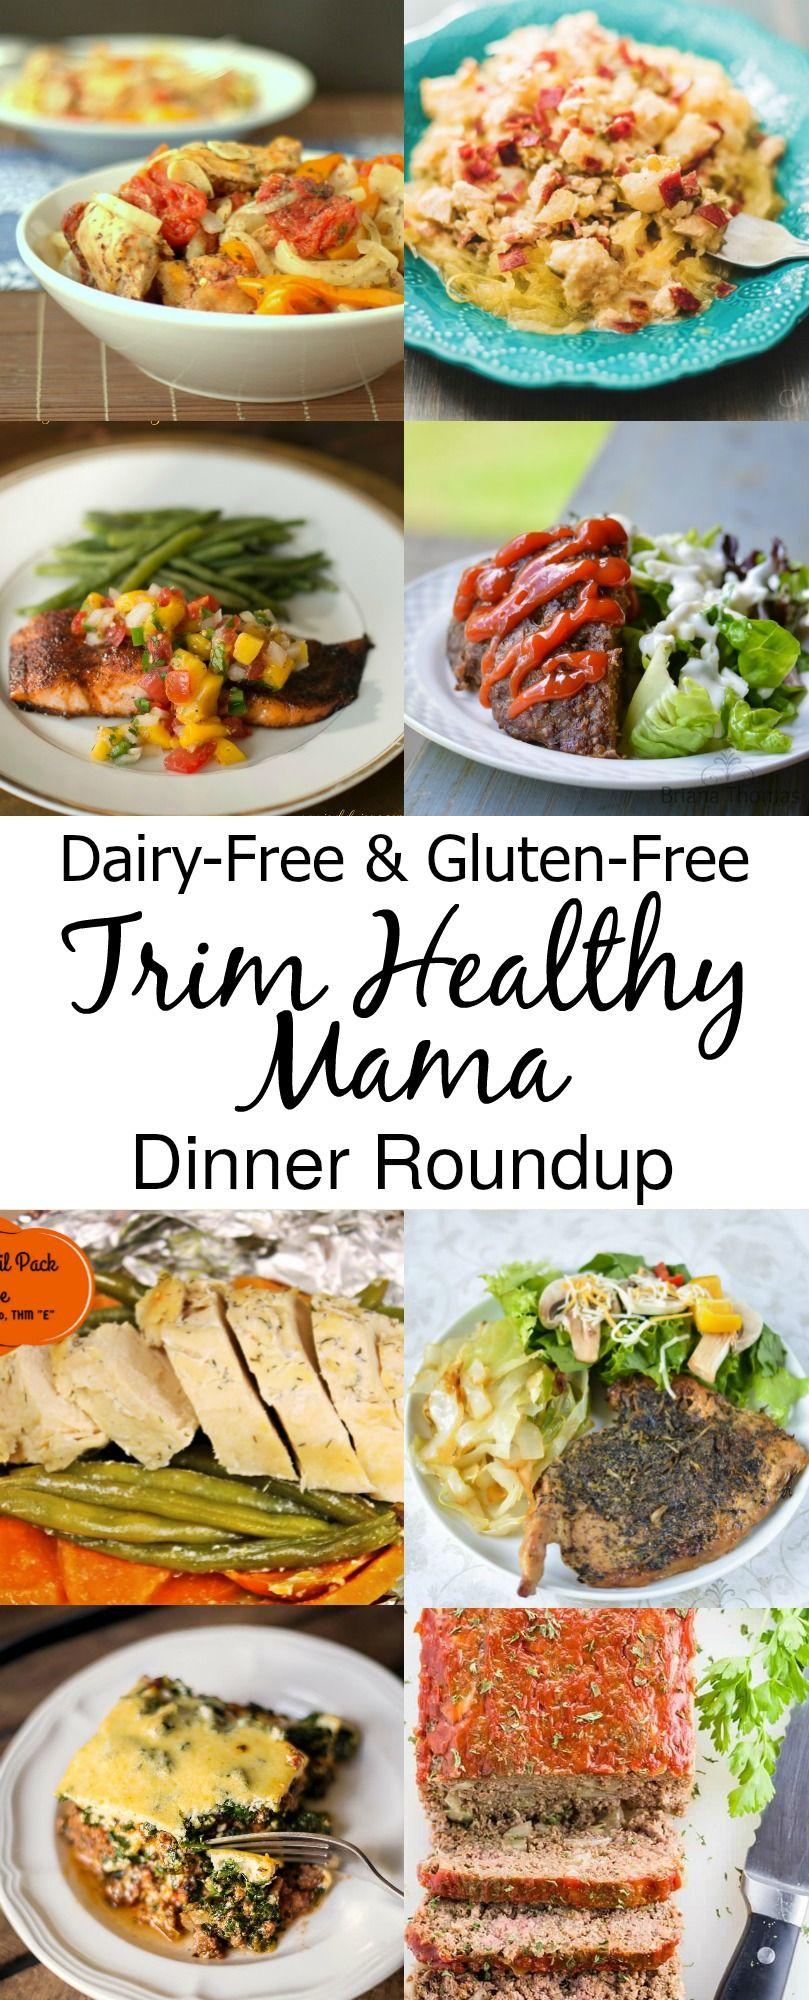 Health dinner dairy free